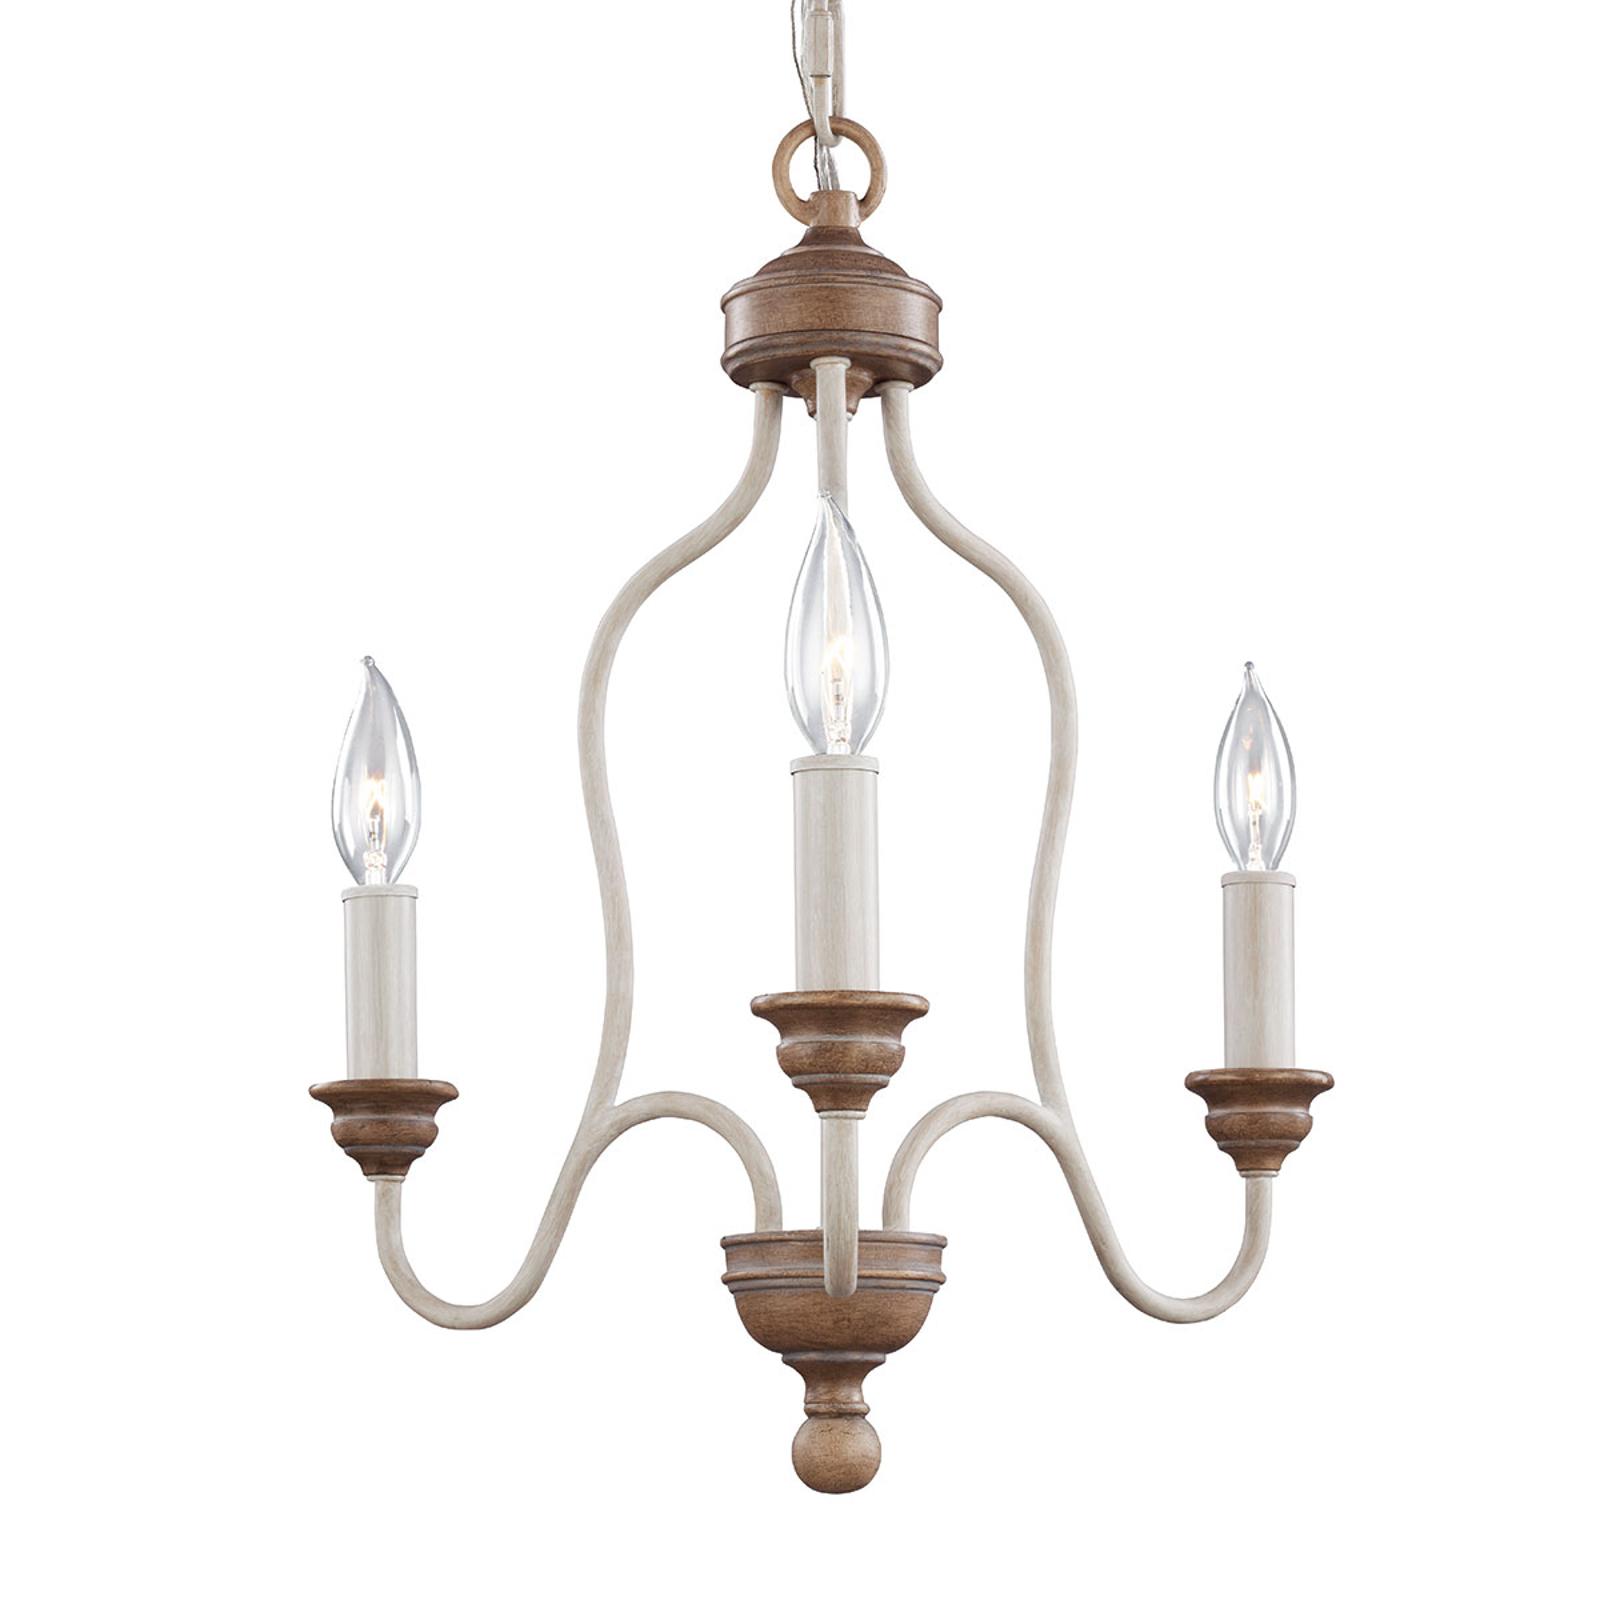 Acquista Hartsville - lampadario in stile fattoria